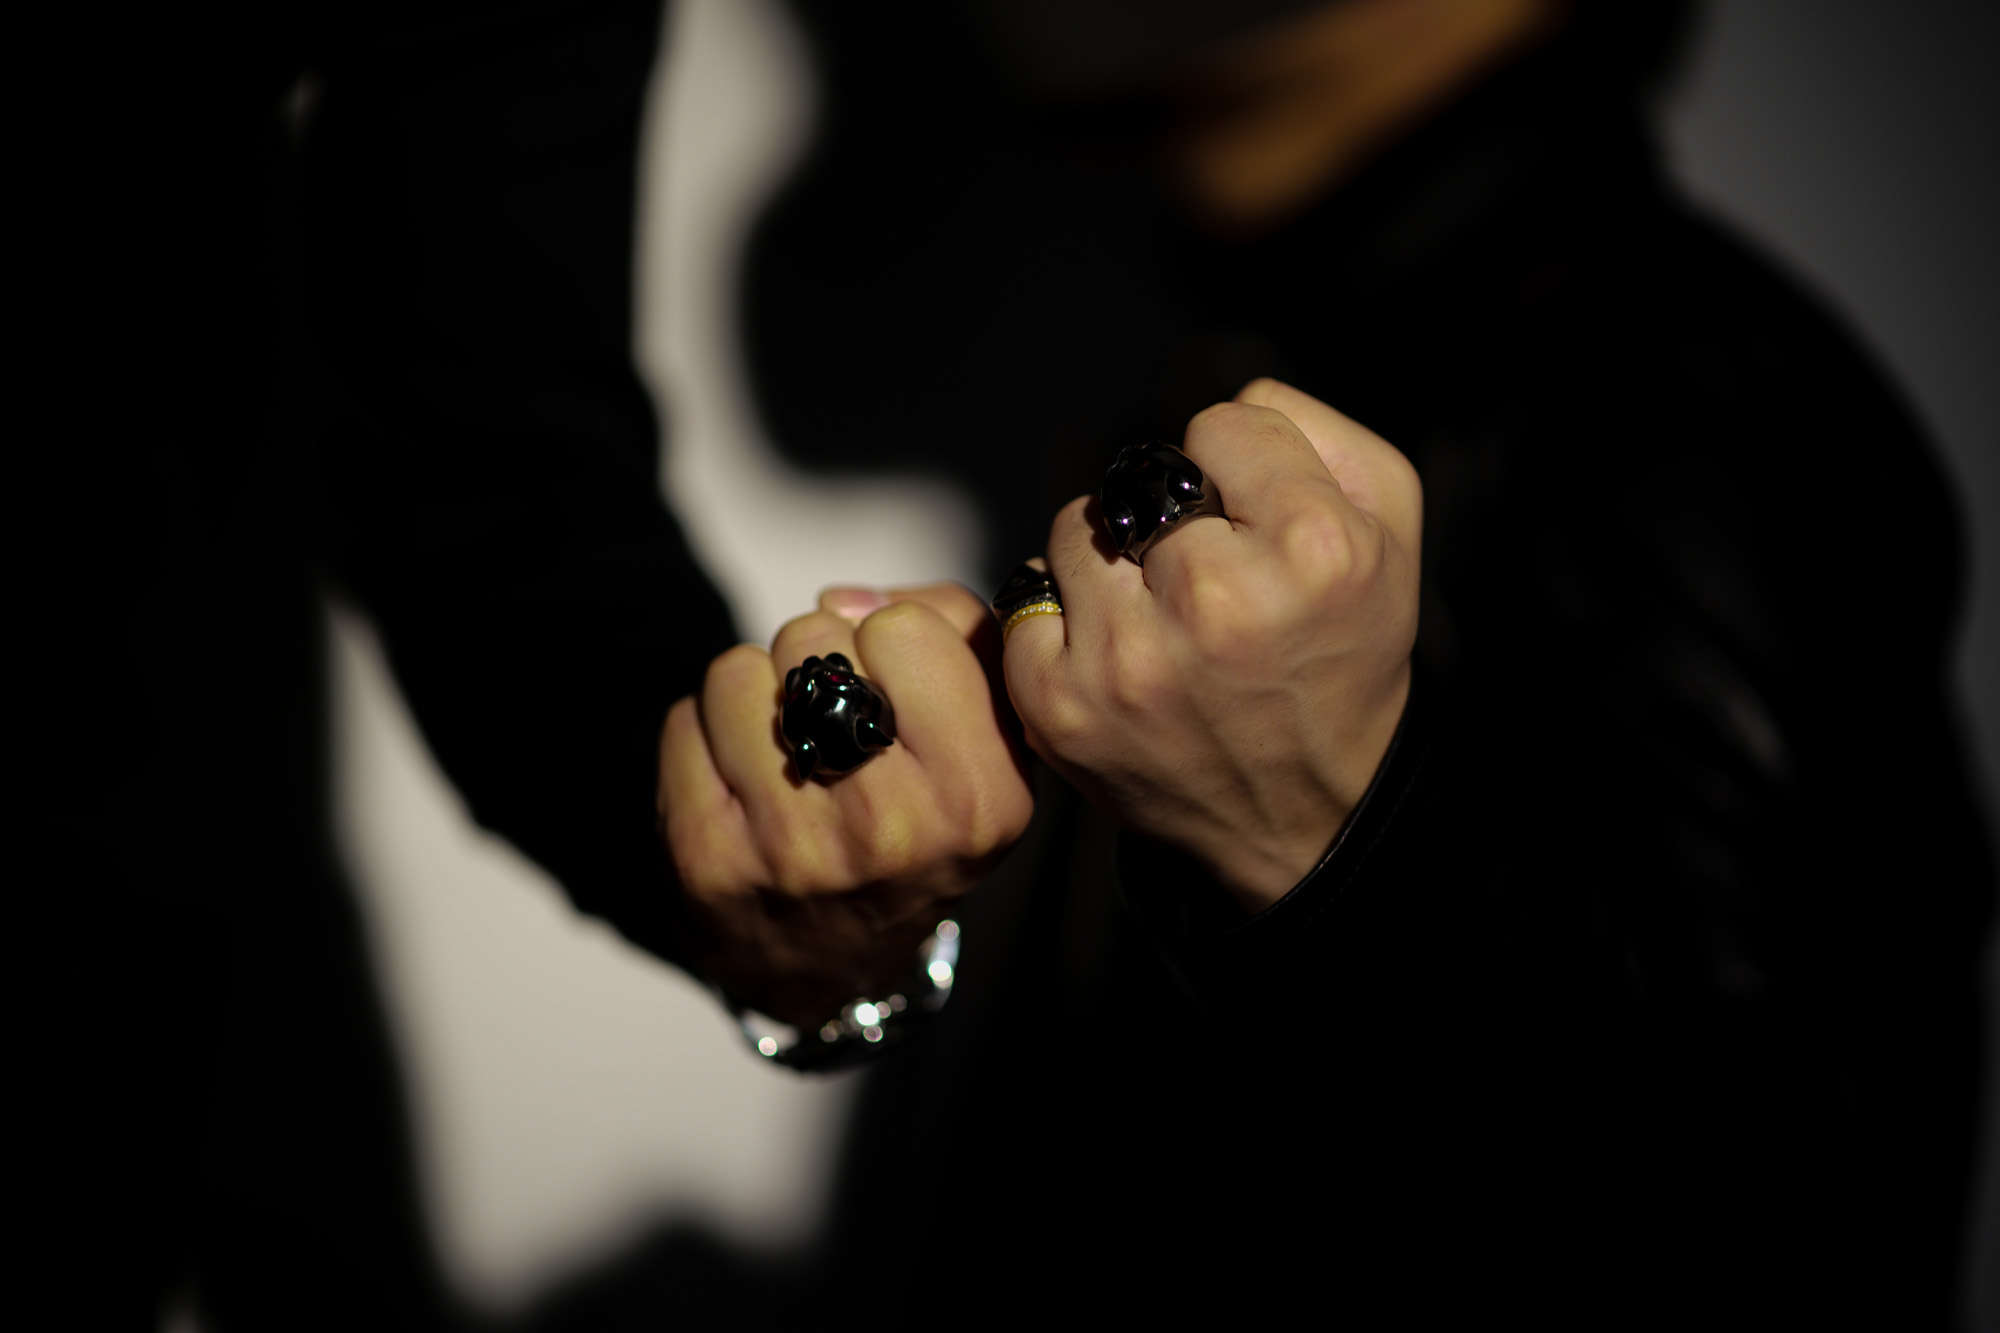 "FIXER(フィクサー) BLACK PANTHER RING ""RUBY"" BLACK RHODIUM(ブラック ロジウム) ブラック パンサーリング ルビー BLACK(ブラック) 2020 【ご予約受付中】【2020.4.11(Sat)~2020.5.03(Sun)】愛知 名古屋 altoediritto アルトエデリット イルミナティリング コーティング"